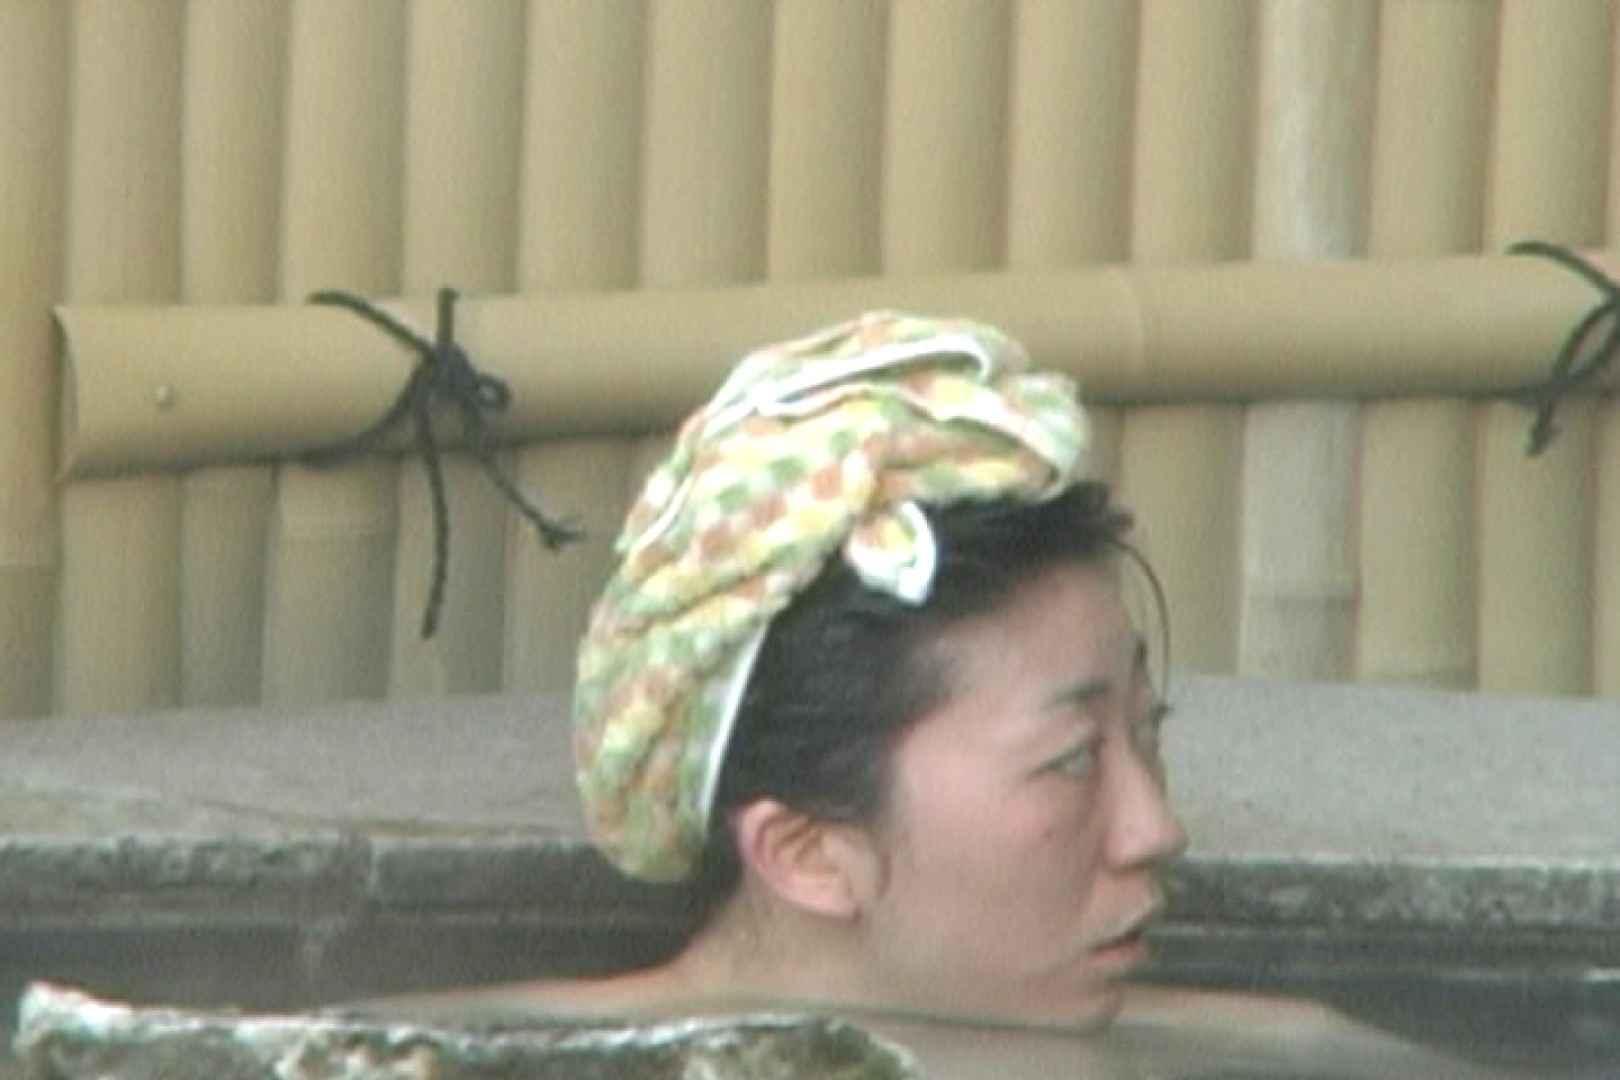 Aquaな露天風呂Vol.594 盗撮師作品 | 露天風呂突入  79pic 49